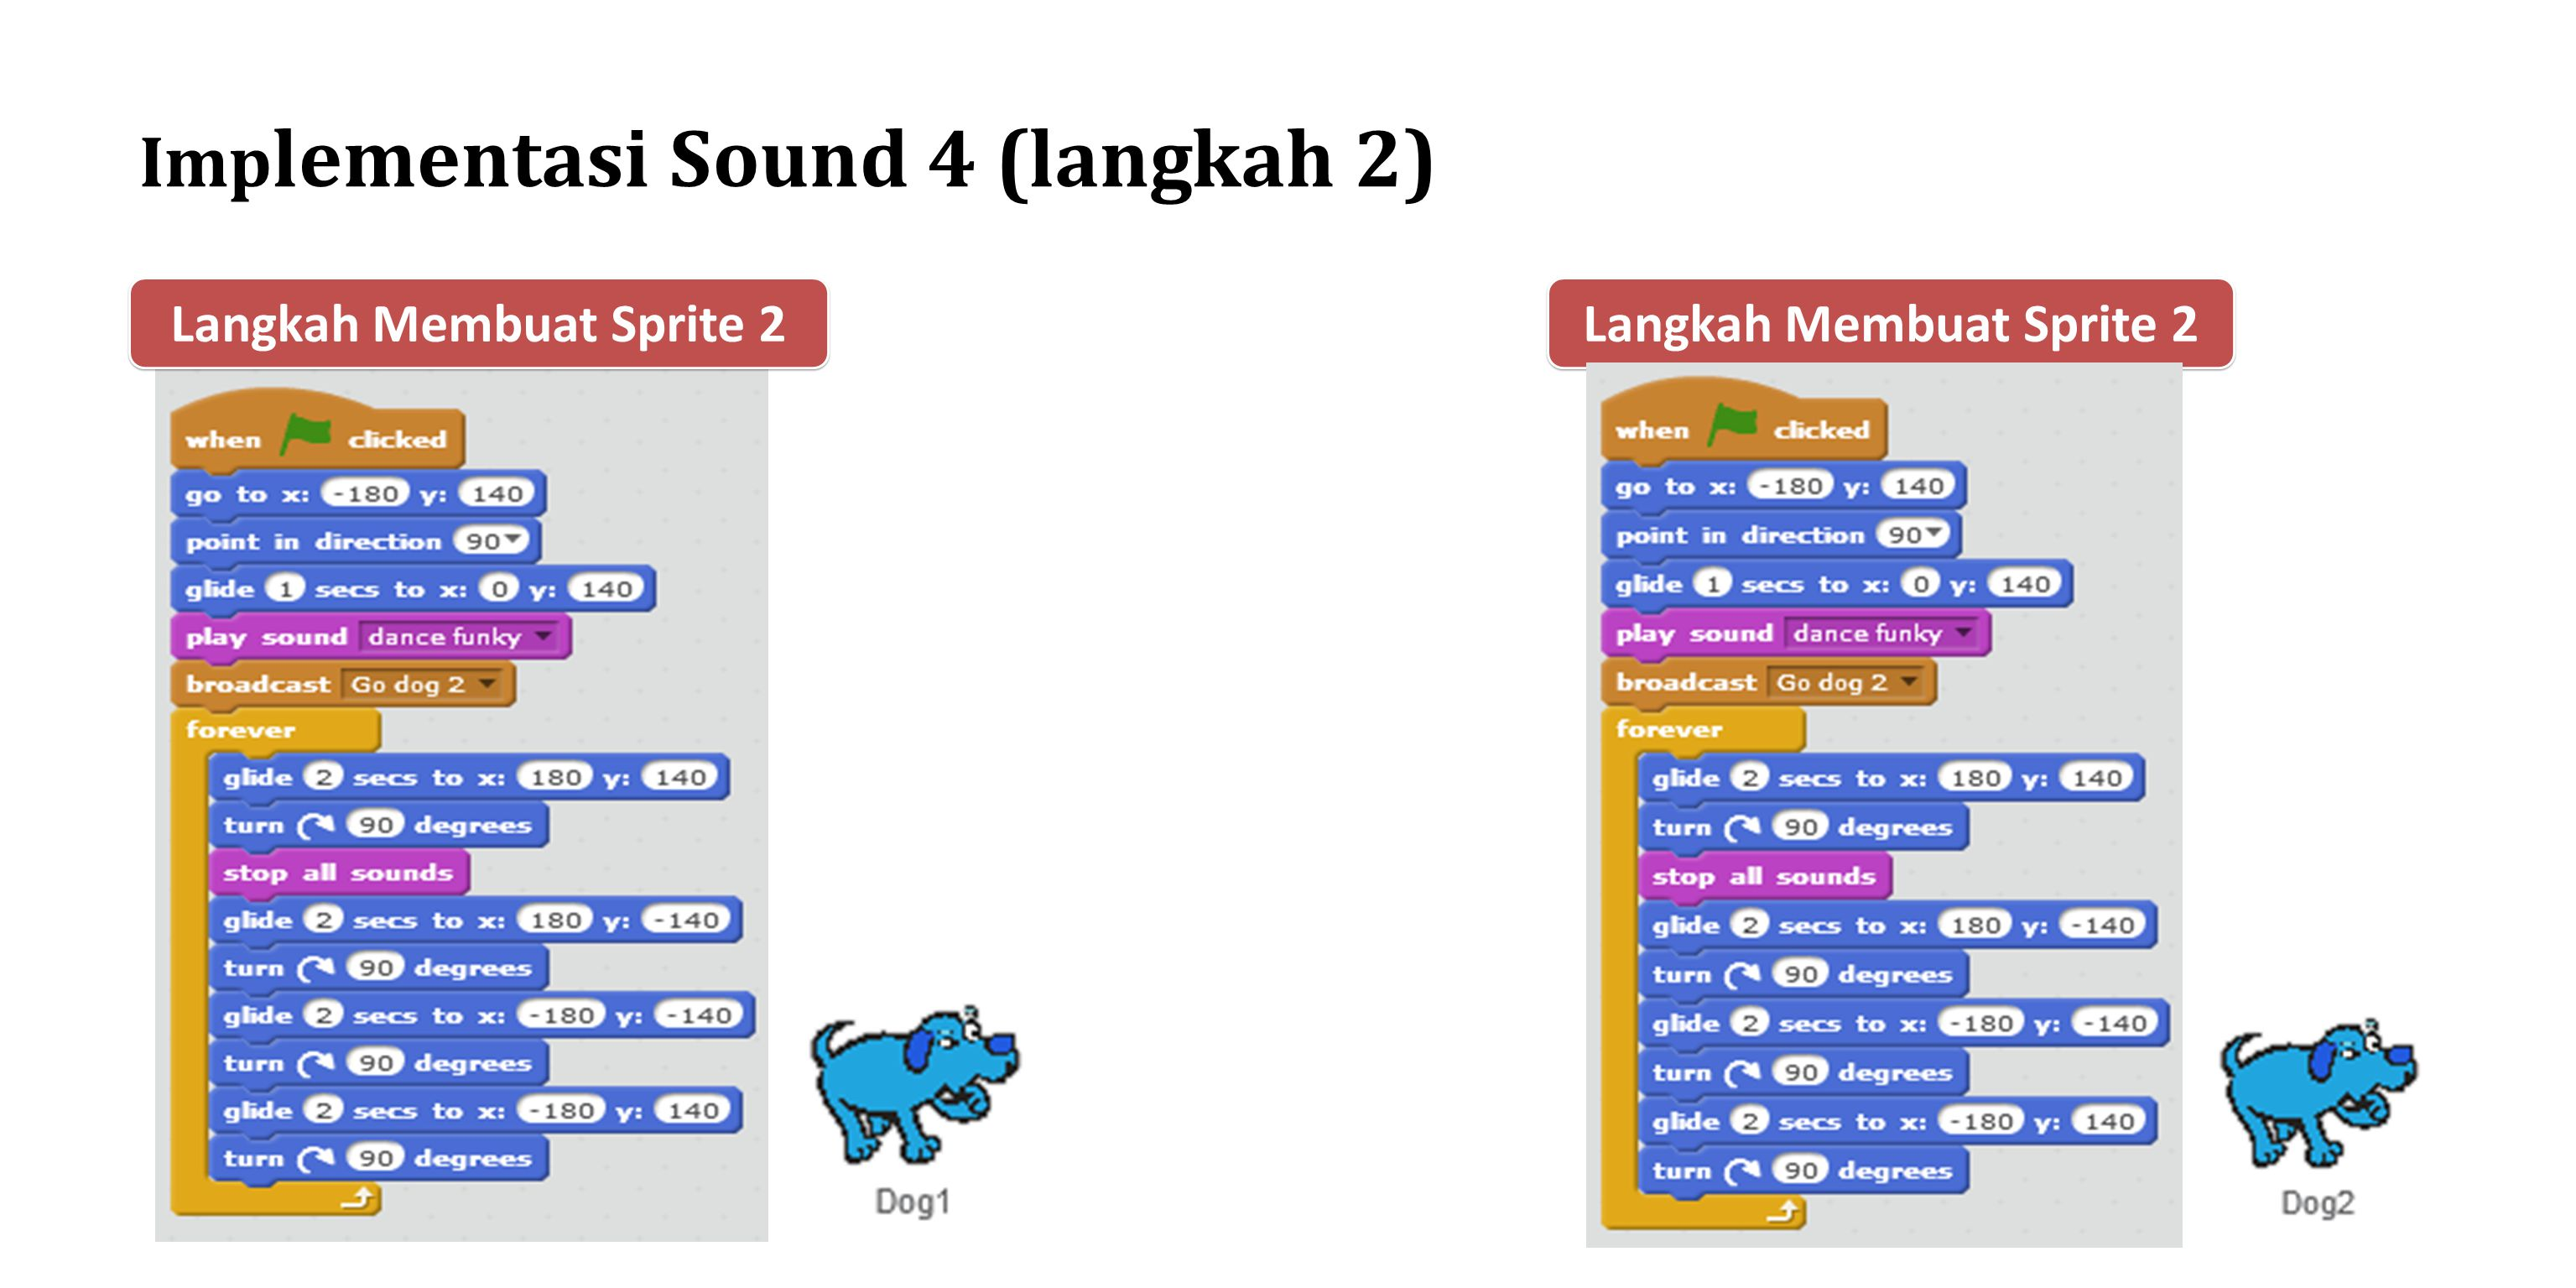 Imp lementasi Sound 4 (langkah 3) Langkah Membuat Sprite 3